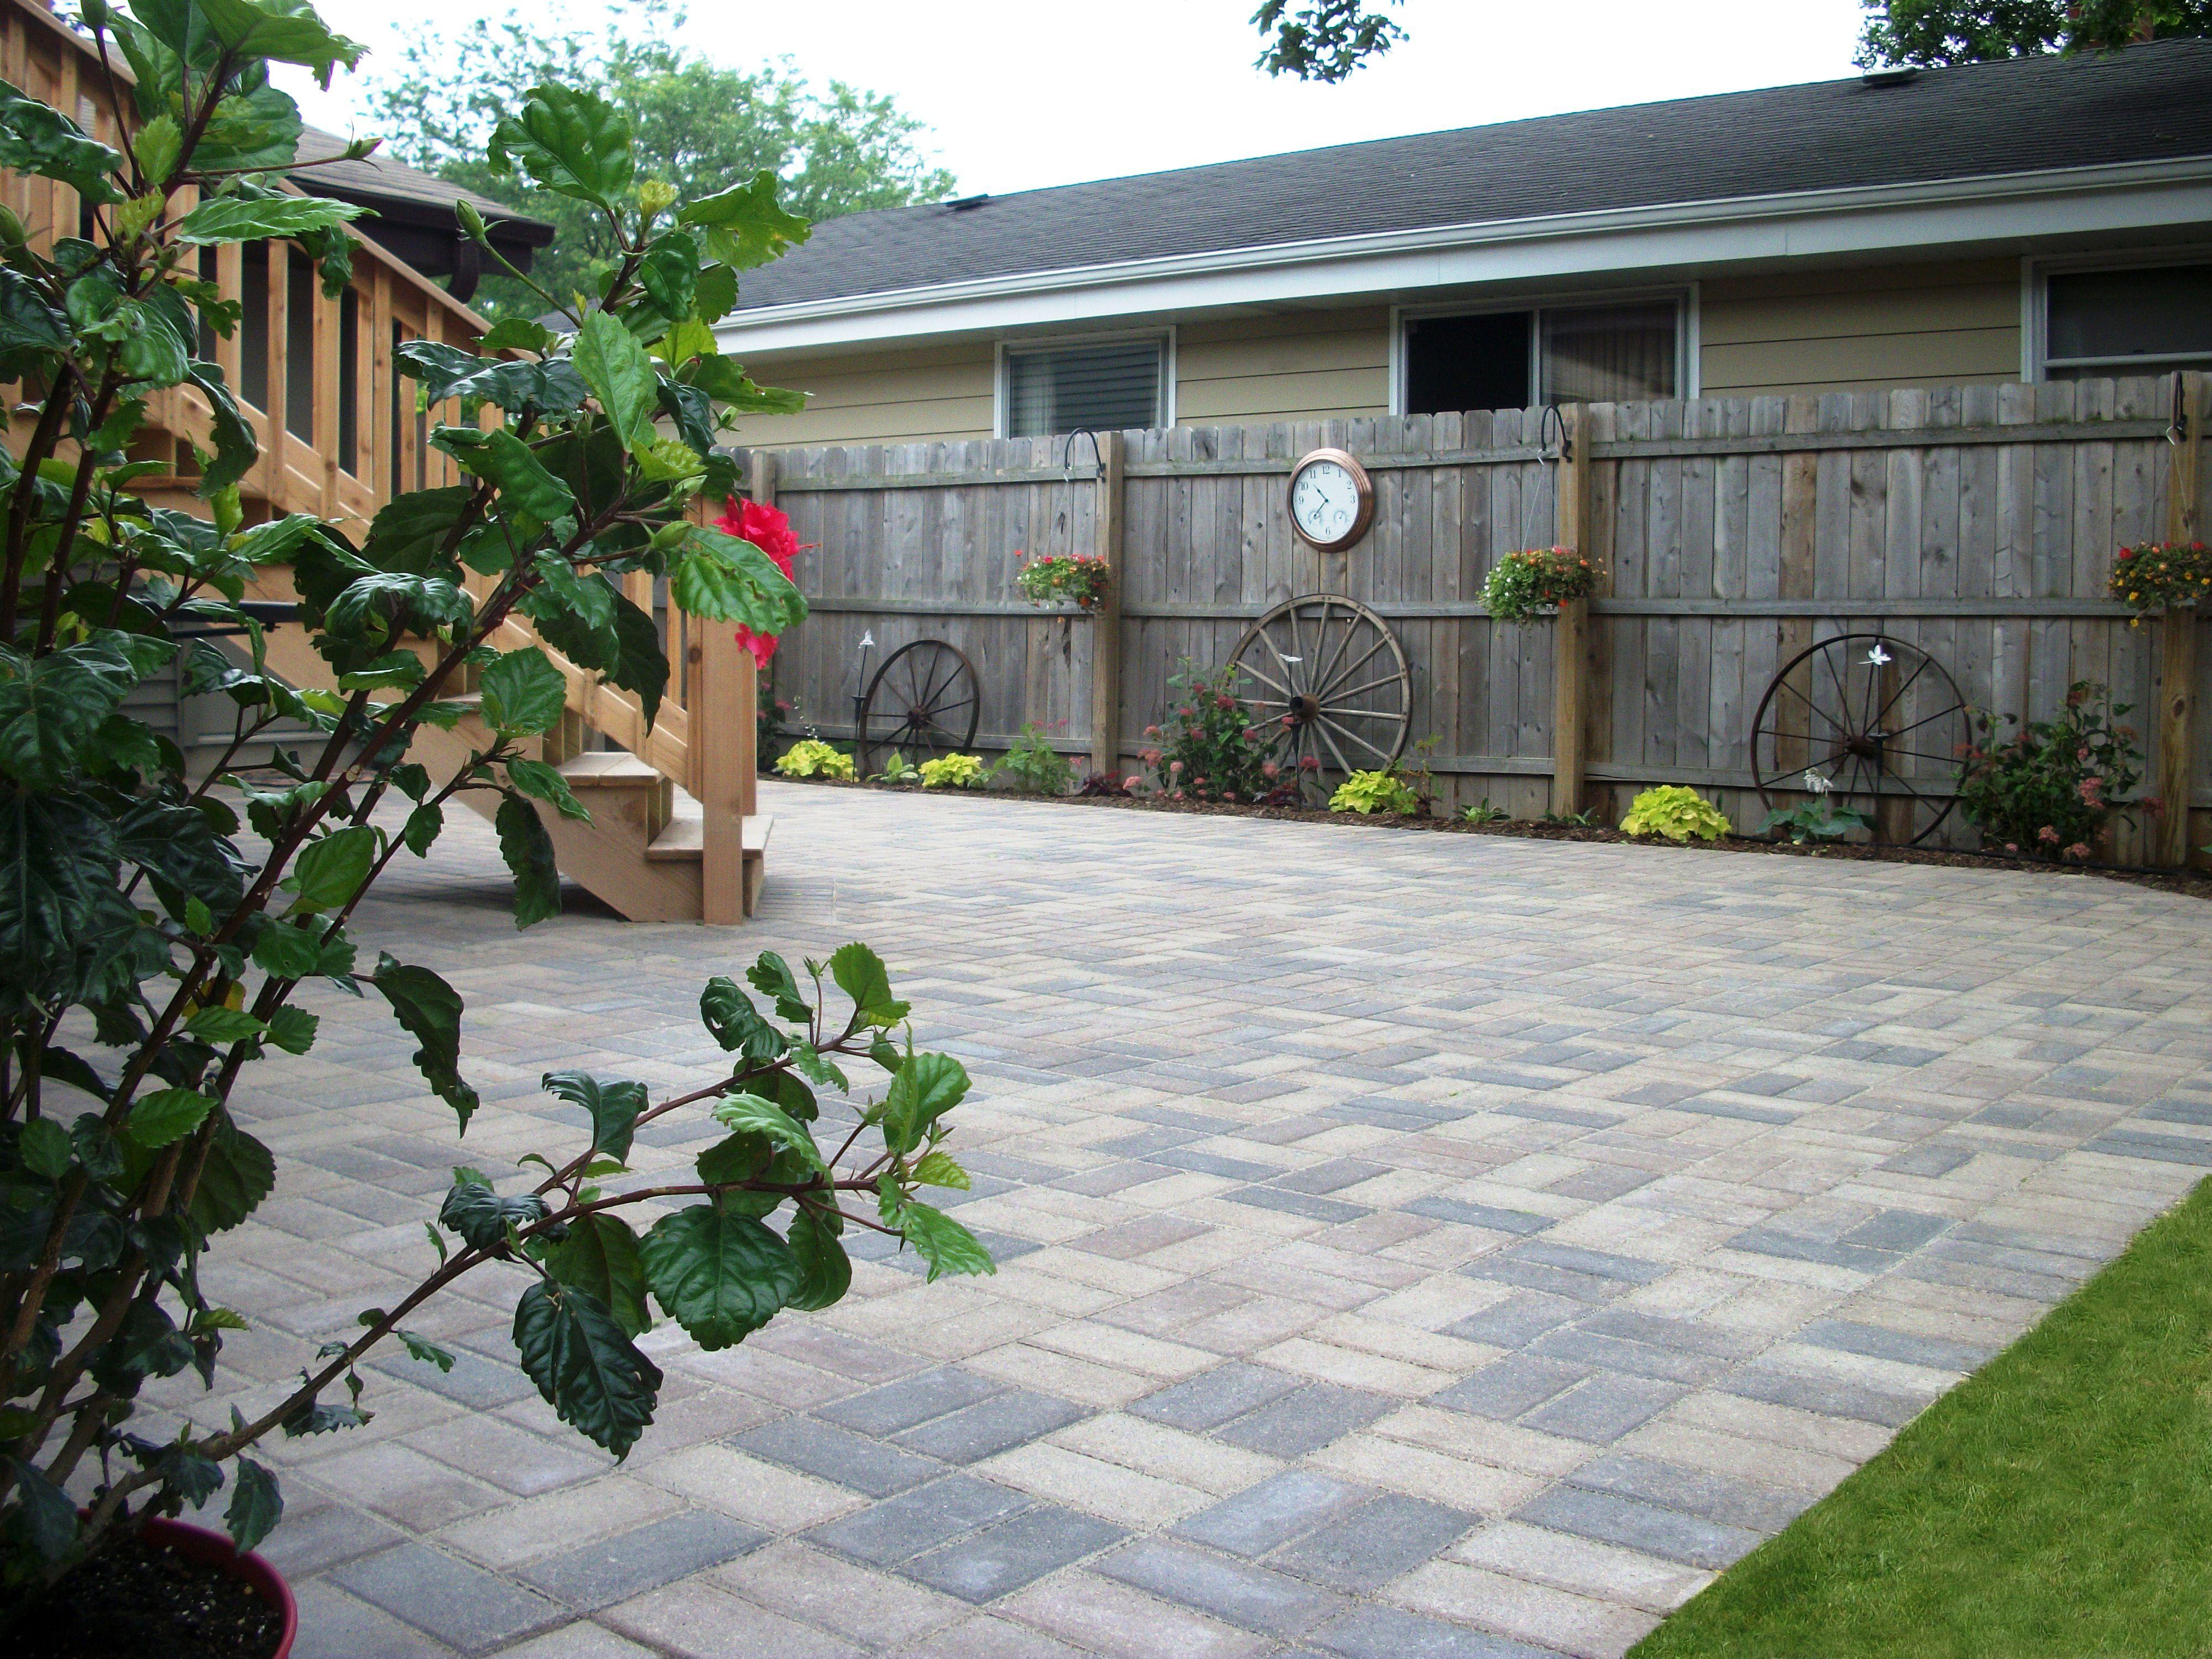 grow rite design unilock hollandstone patio in the color sierra